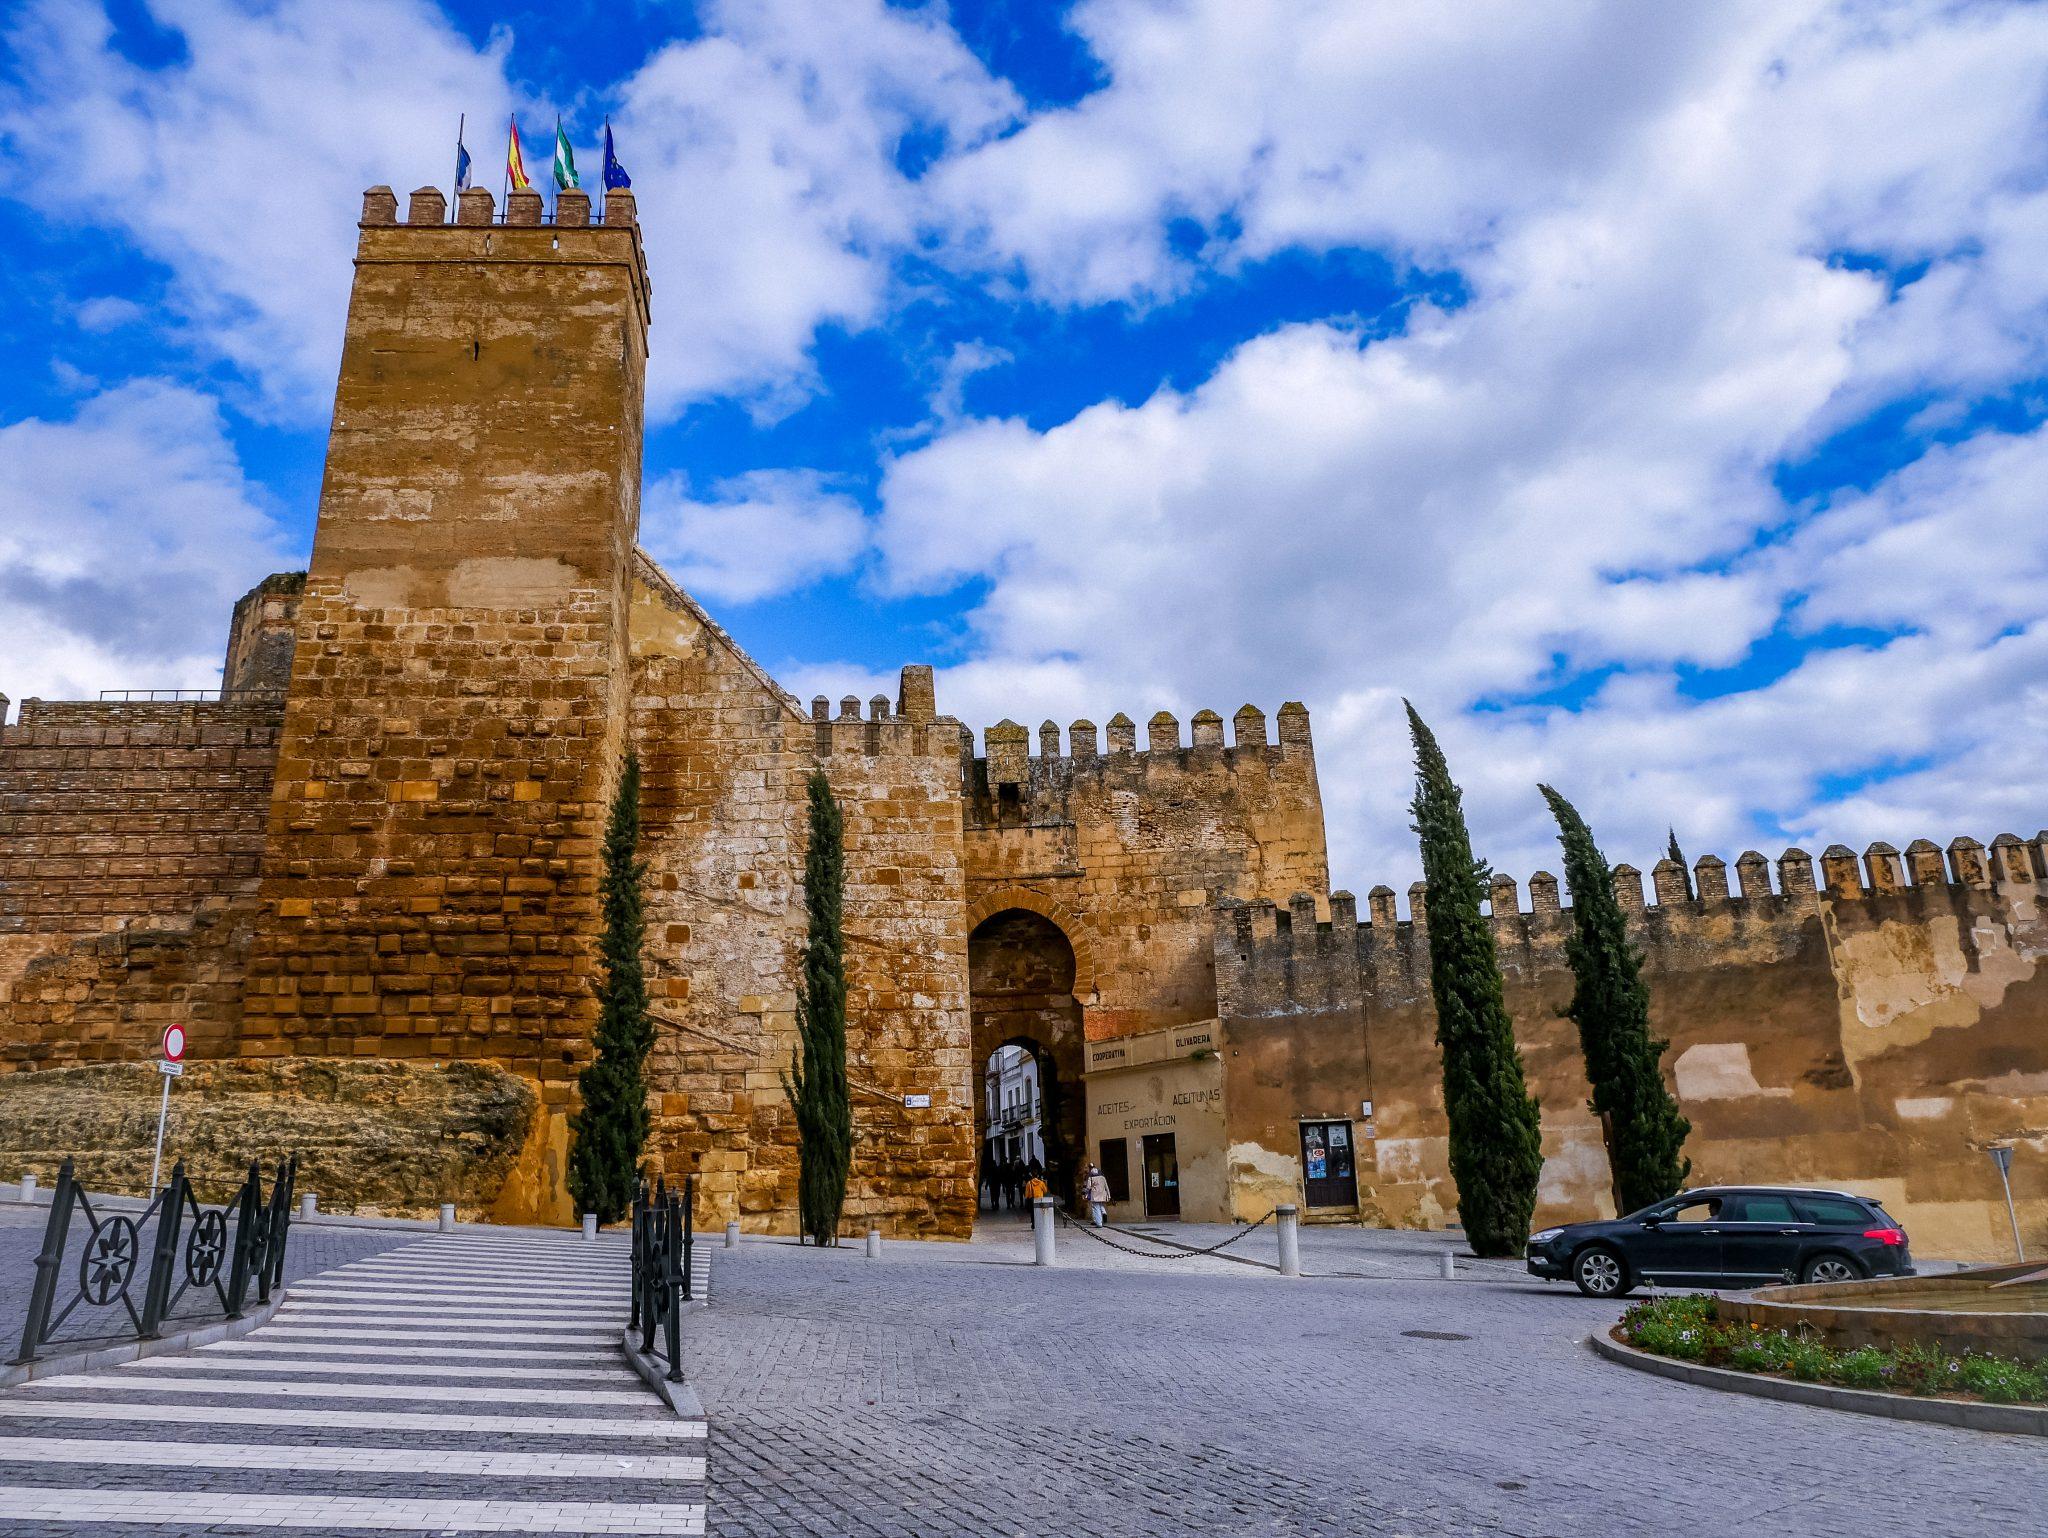 Die Altstadt liegt zwischen den beiden früheren Stadttoren: Puerto de Sevilla und Puerta de Córdoba